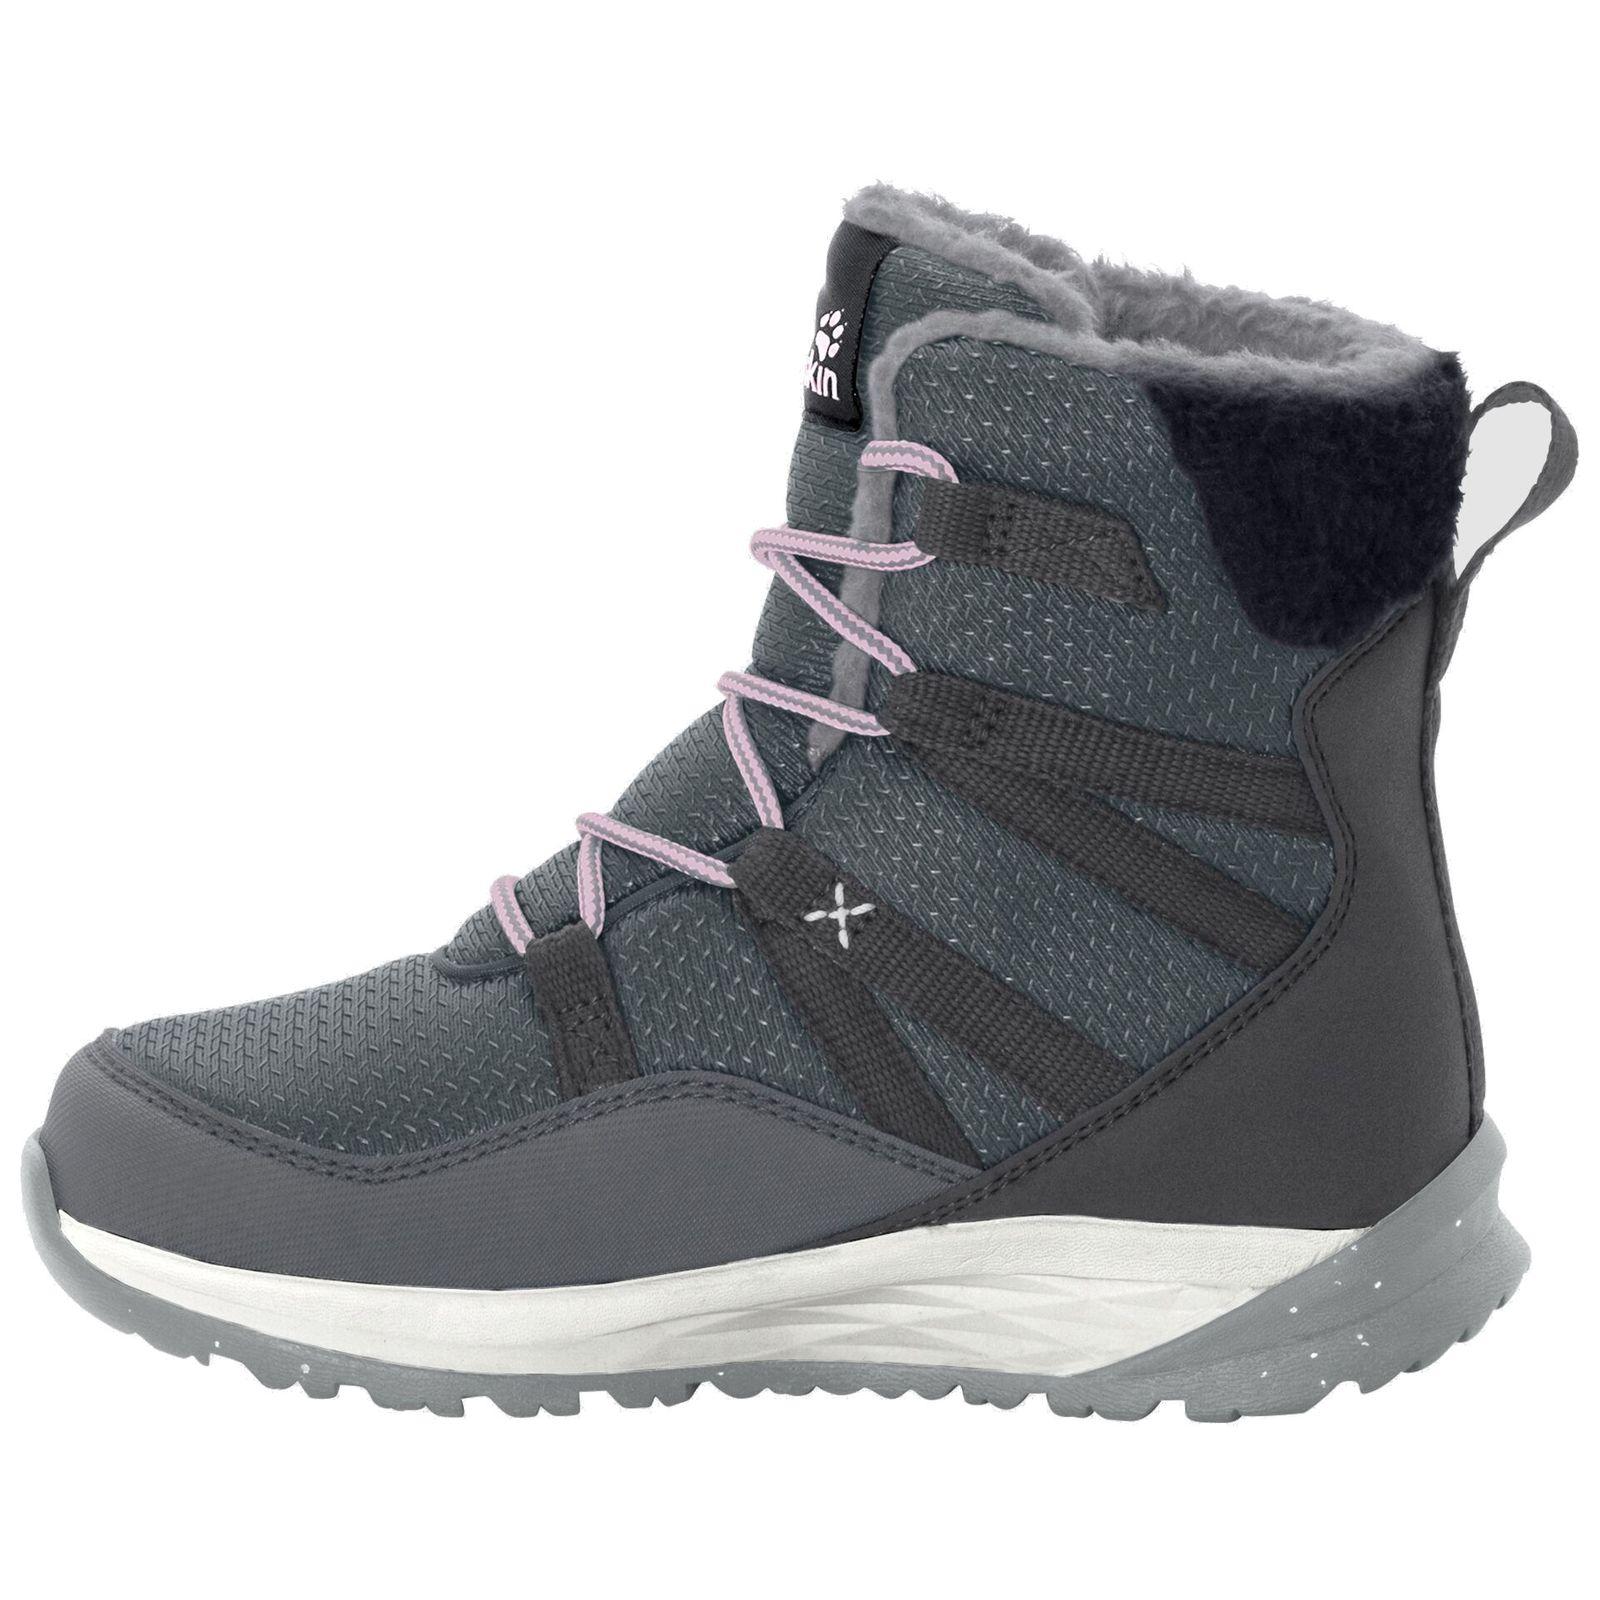 Boots High Polar K Shoes Wolfskin Children About Texapore Jack Grey Wolf Details Winter dCQErxBeWo